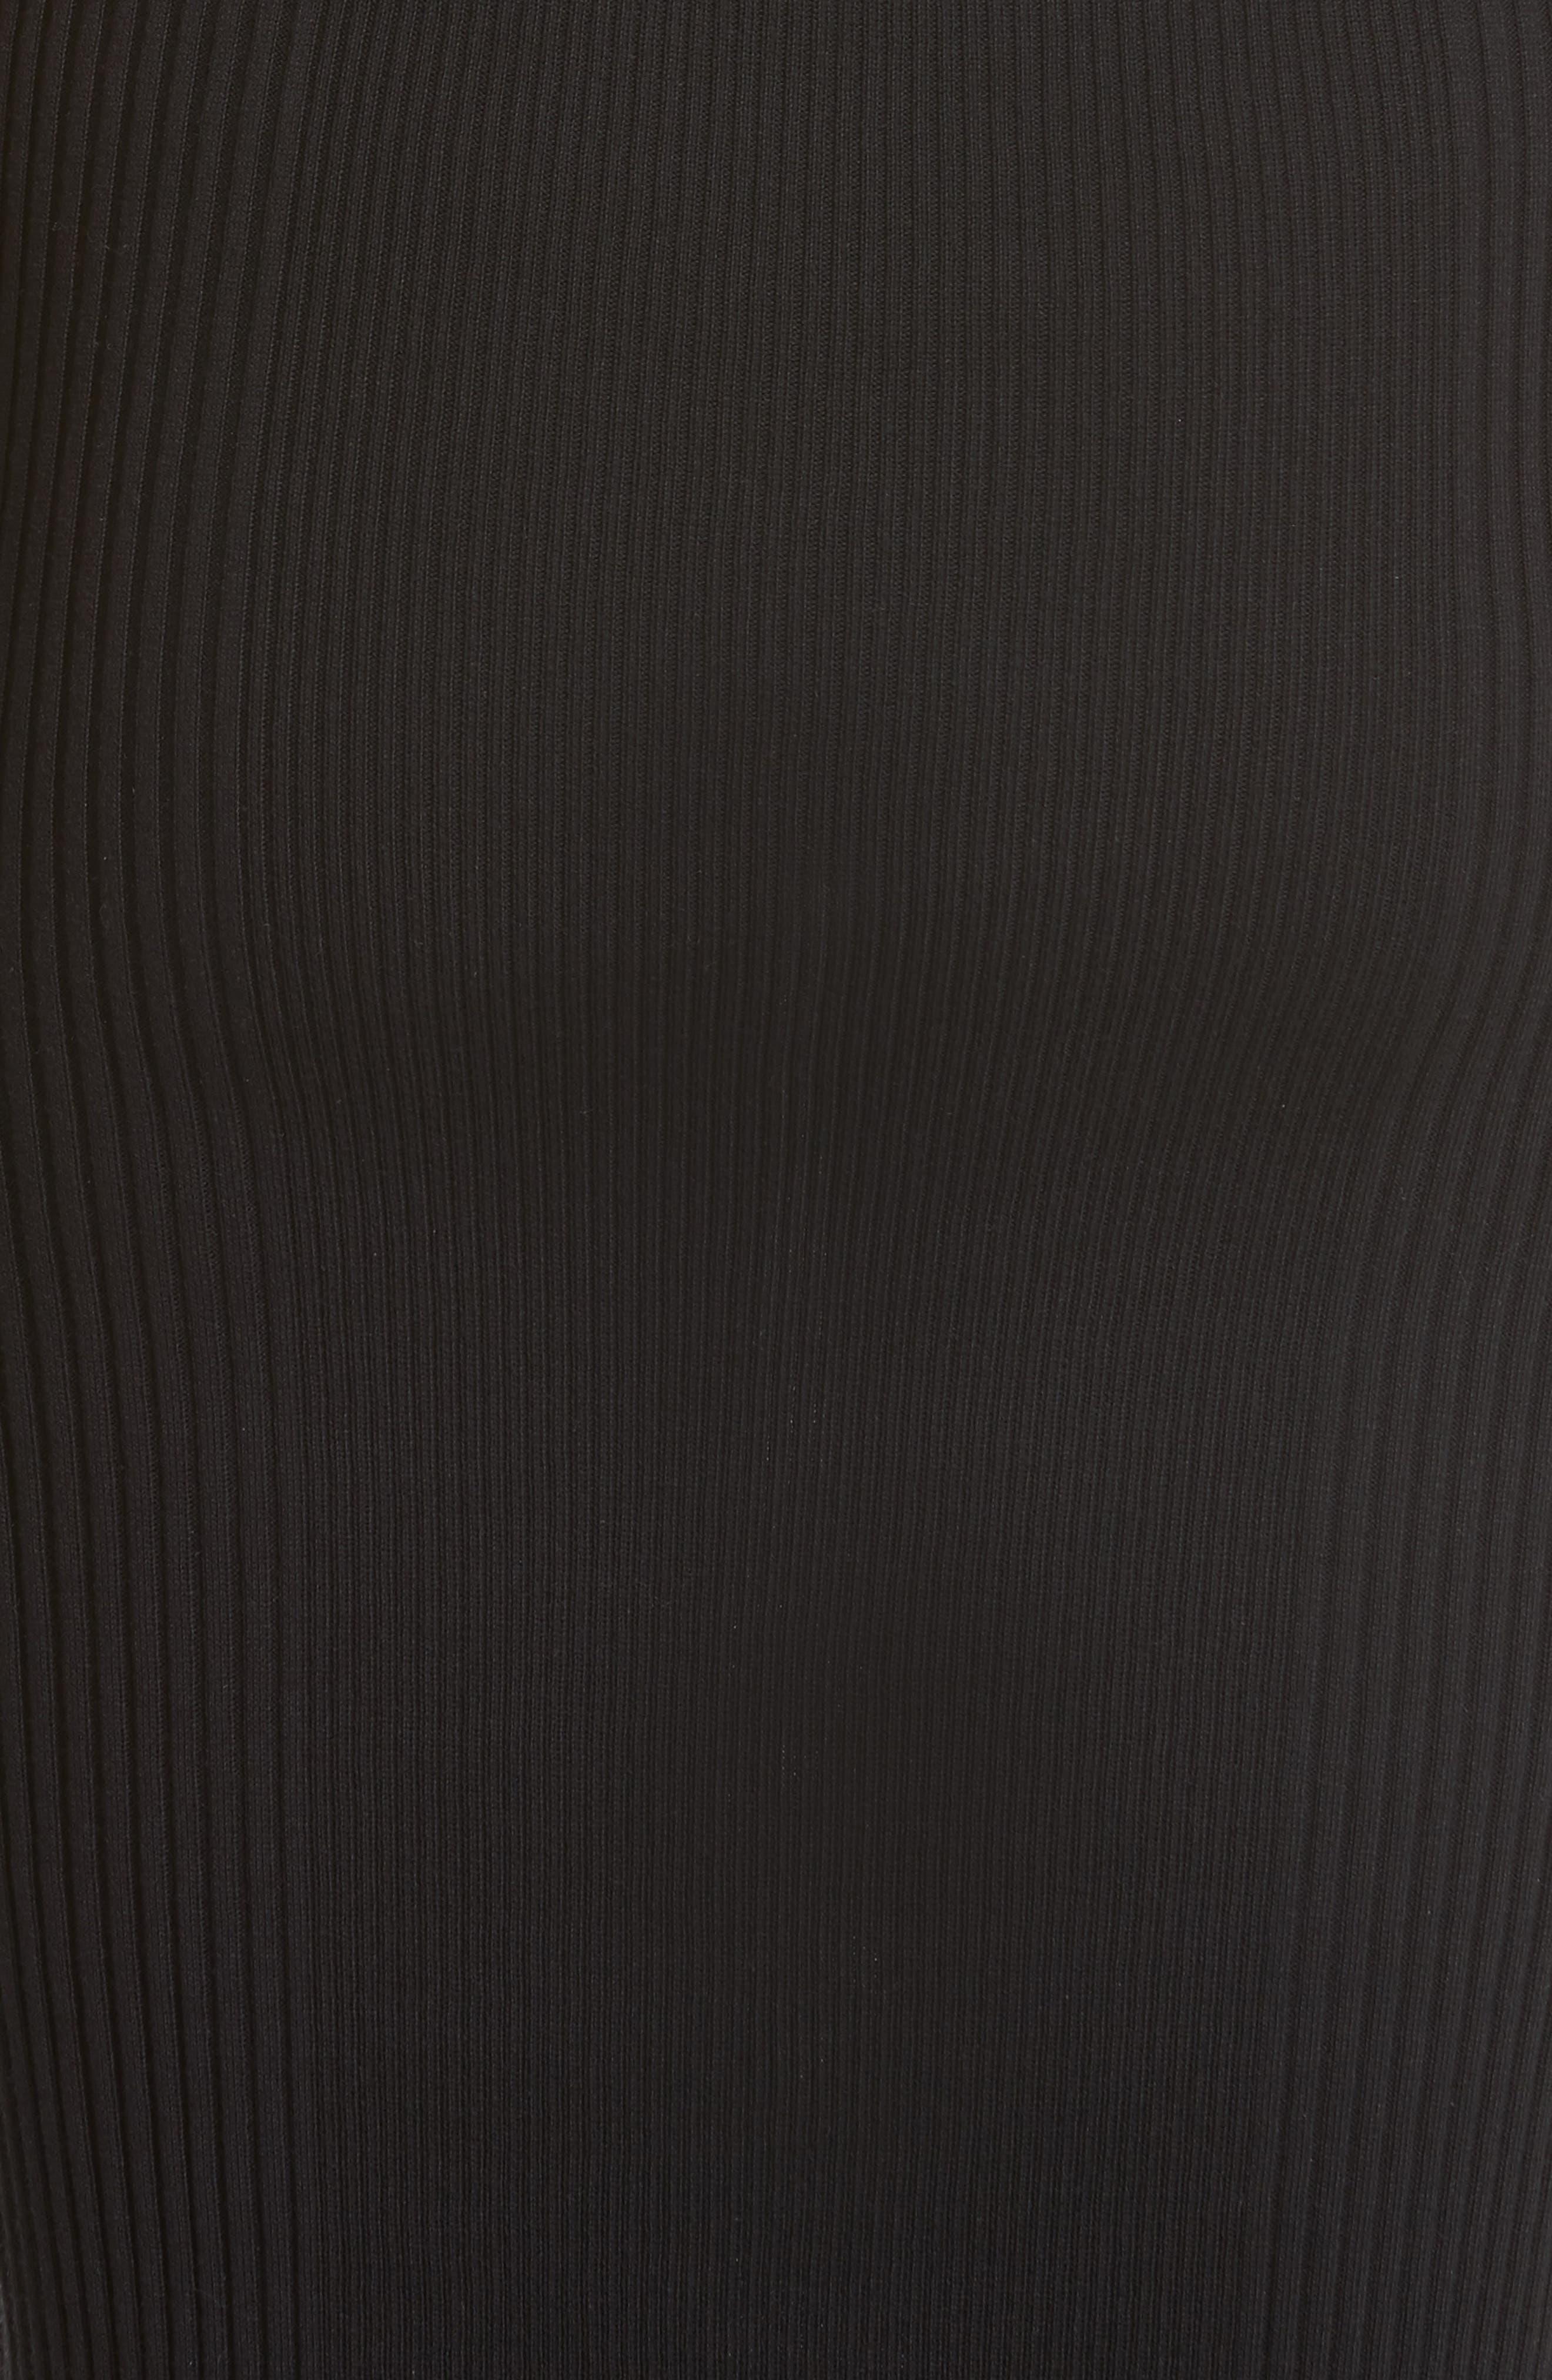 Knit Cold Shoulder Dress,                             Alternate thumbnail 5, color,